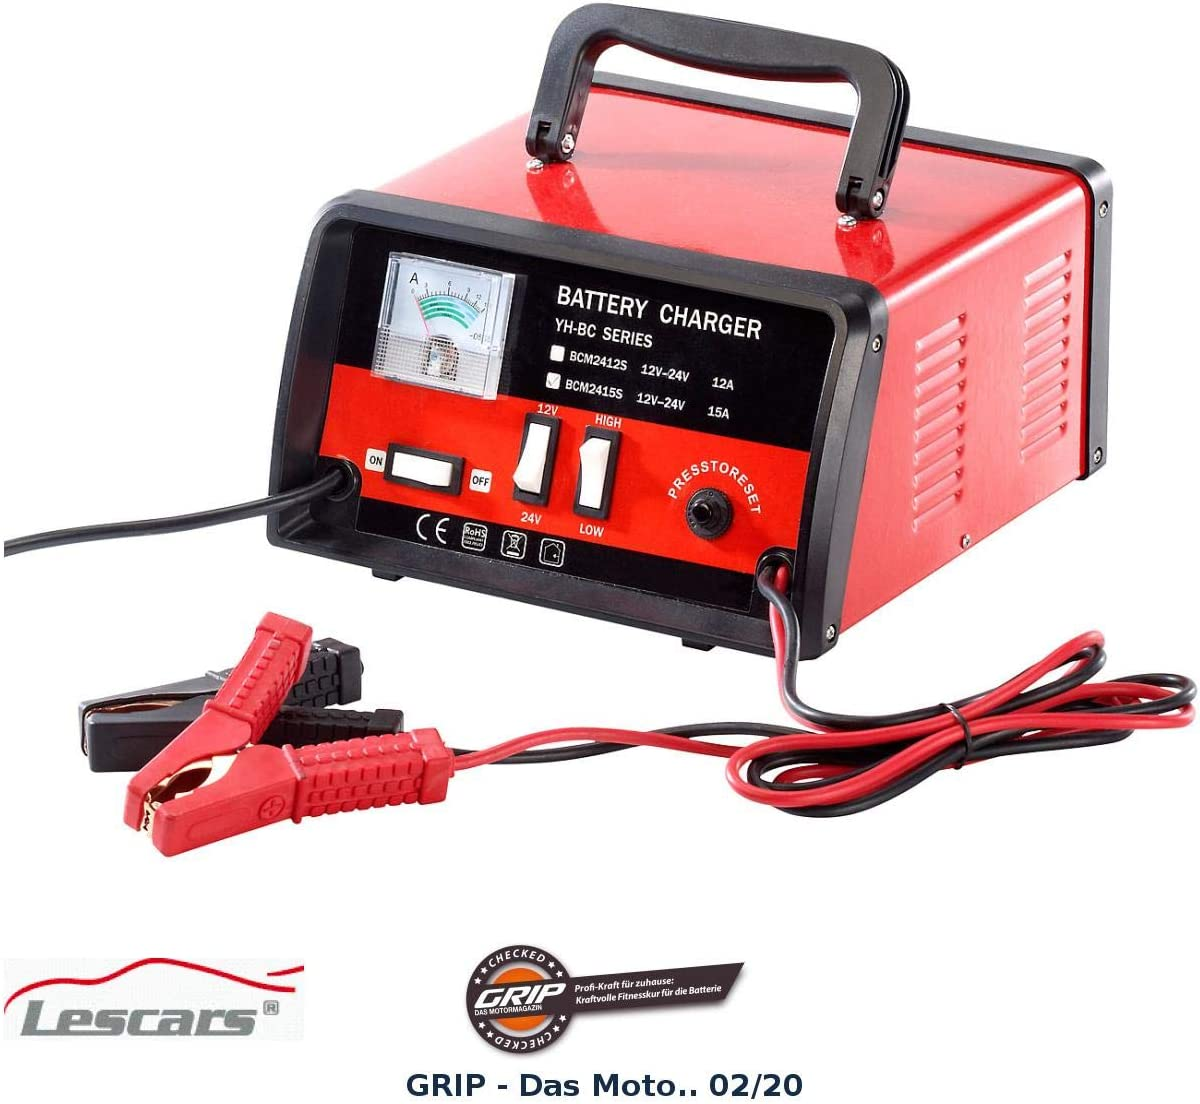 Lescars Profi Batterieladegerät Für 12 24 Volt Max 15 A Auto